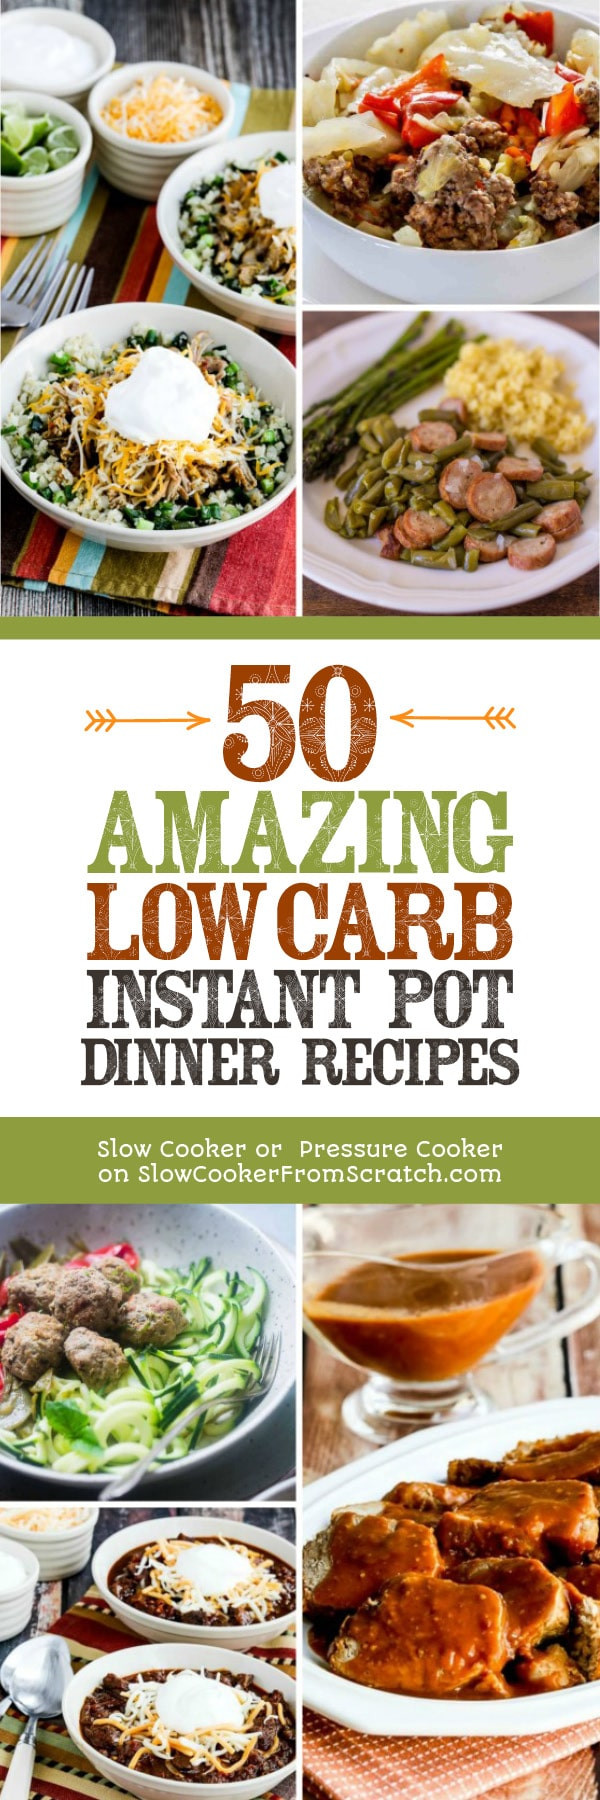 Healthy Instant Pot Recipes Low Carb  50 AMAZING Low Carb Instant Pot Dinner Recipes Slow